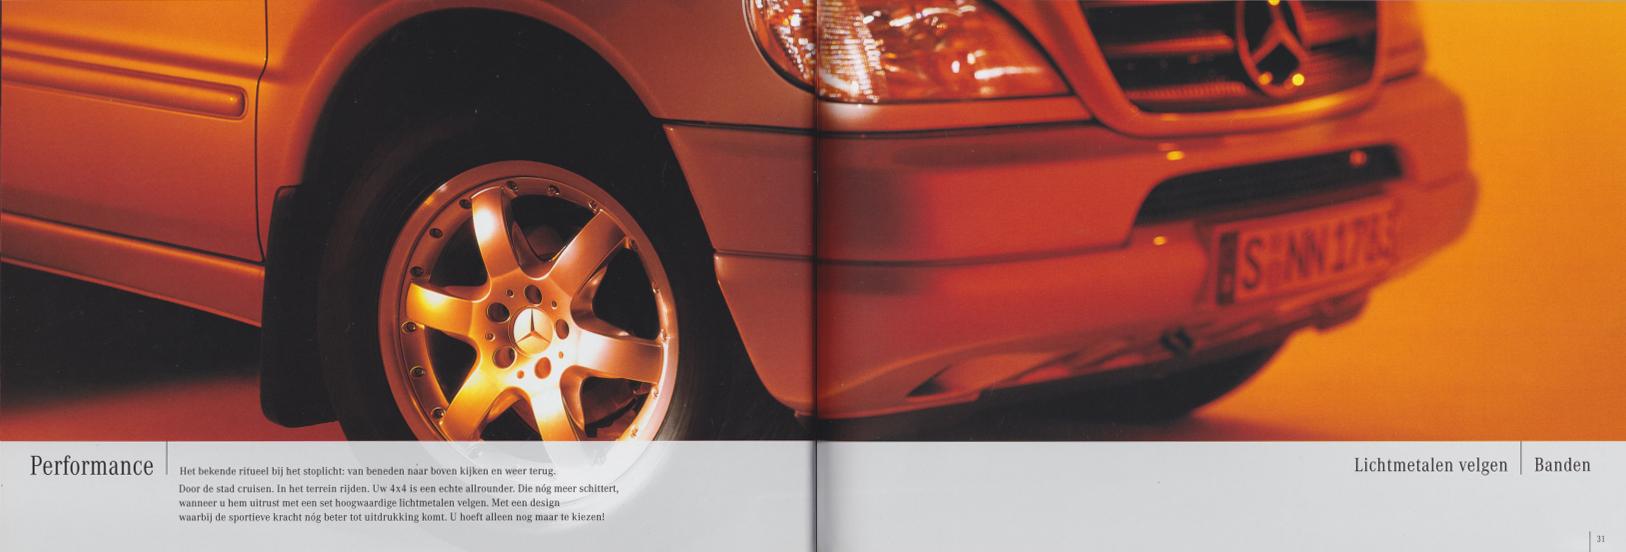 (W163): Catálogo 2001 - acessórios - neerlandês 016